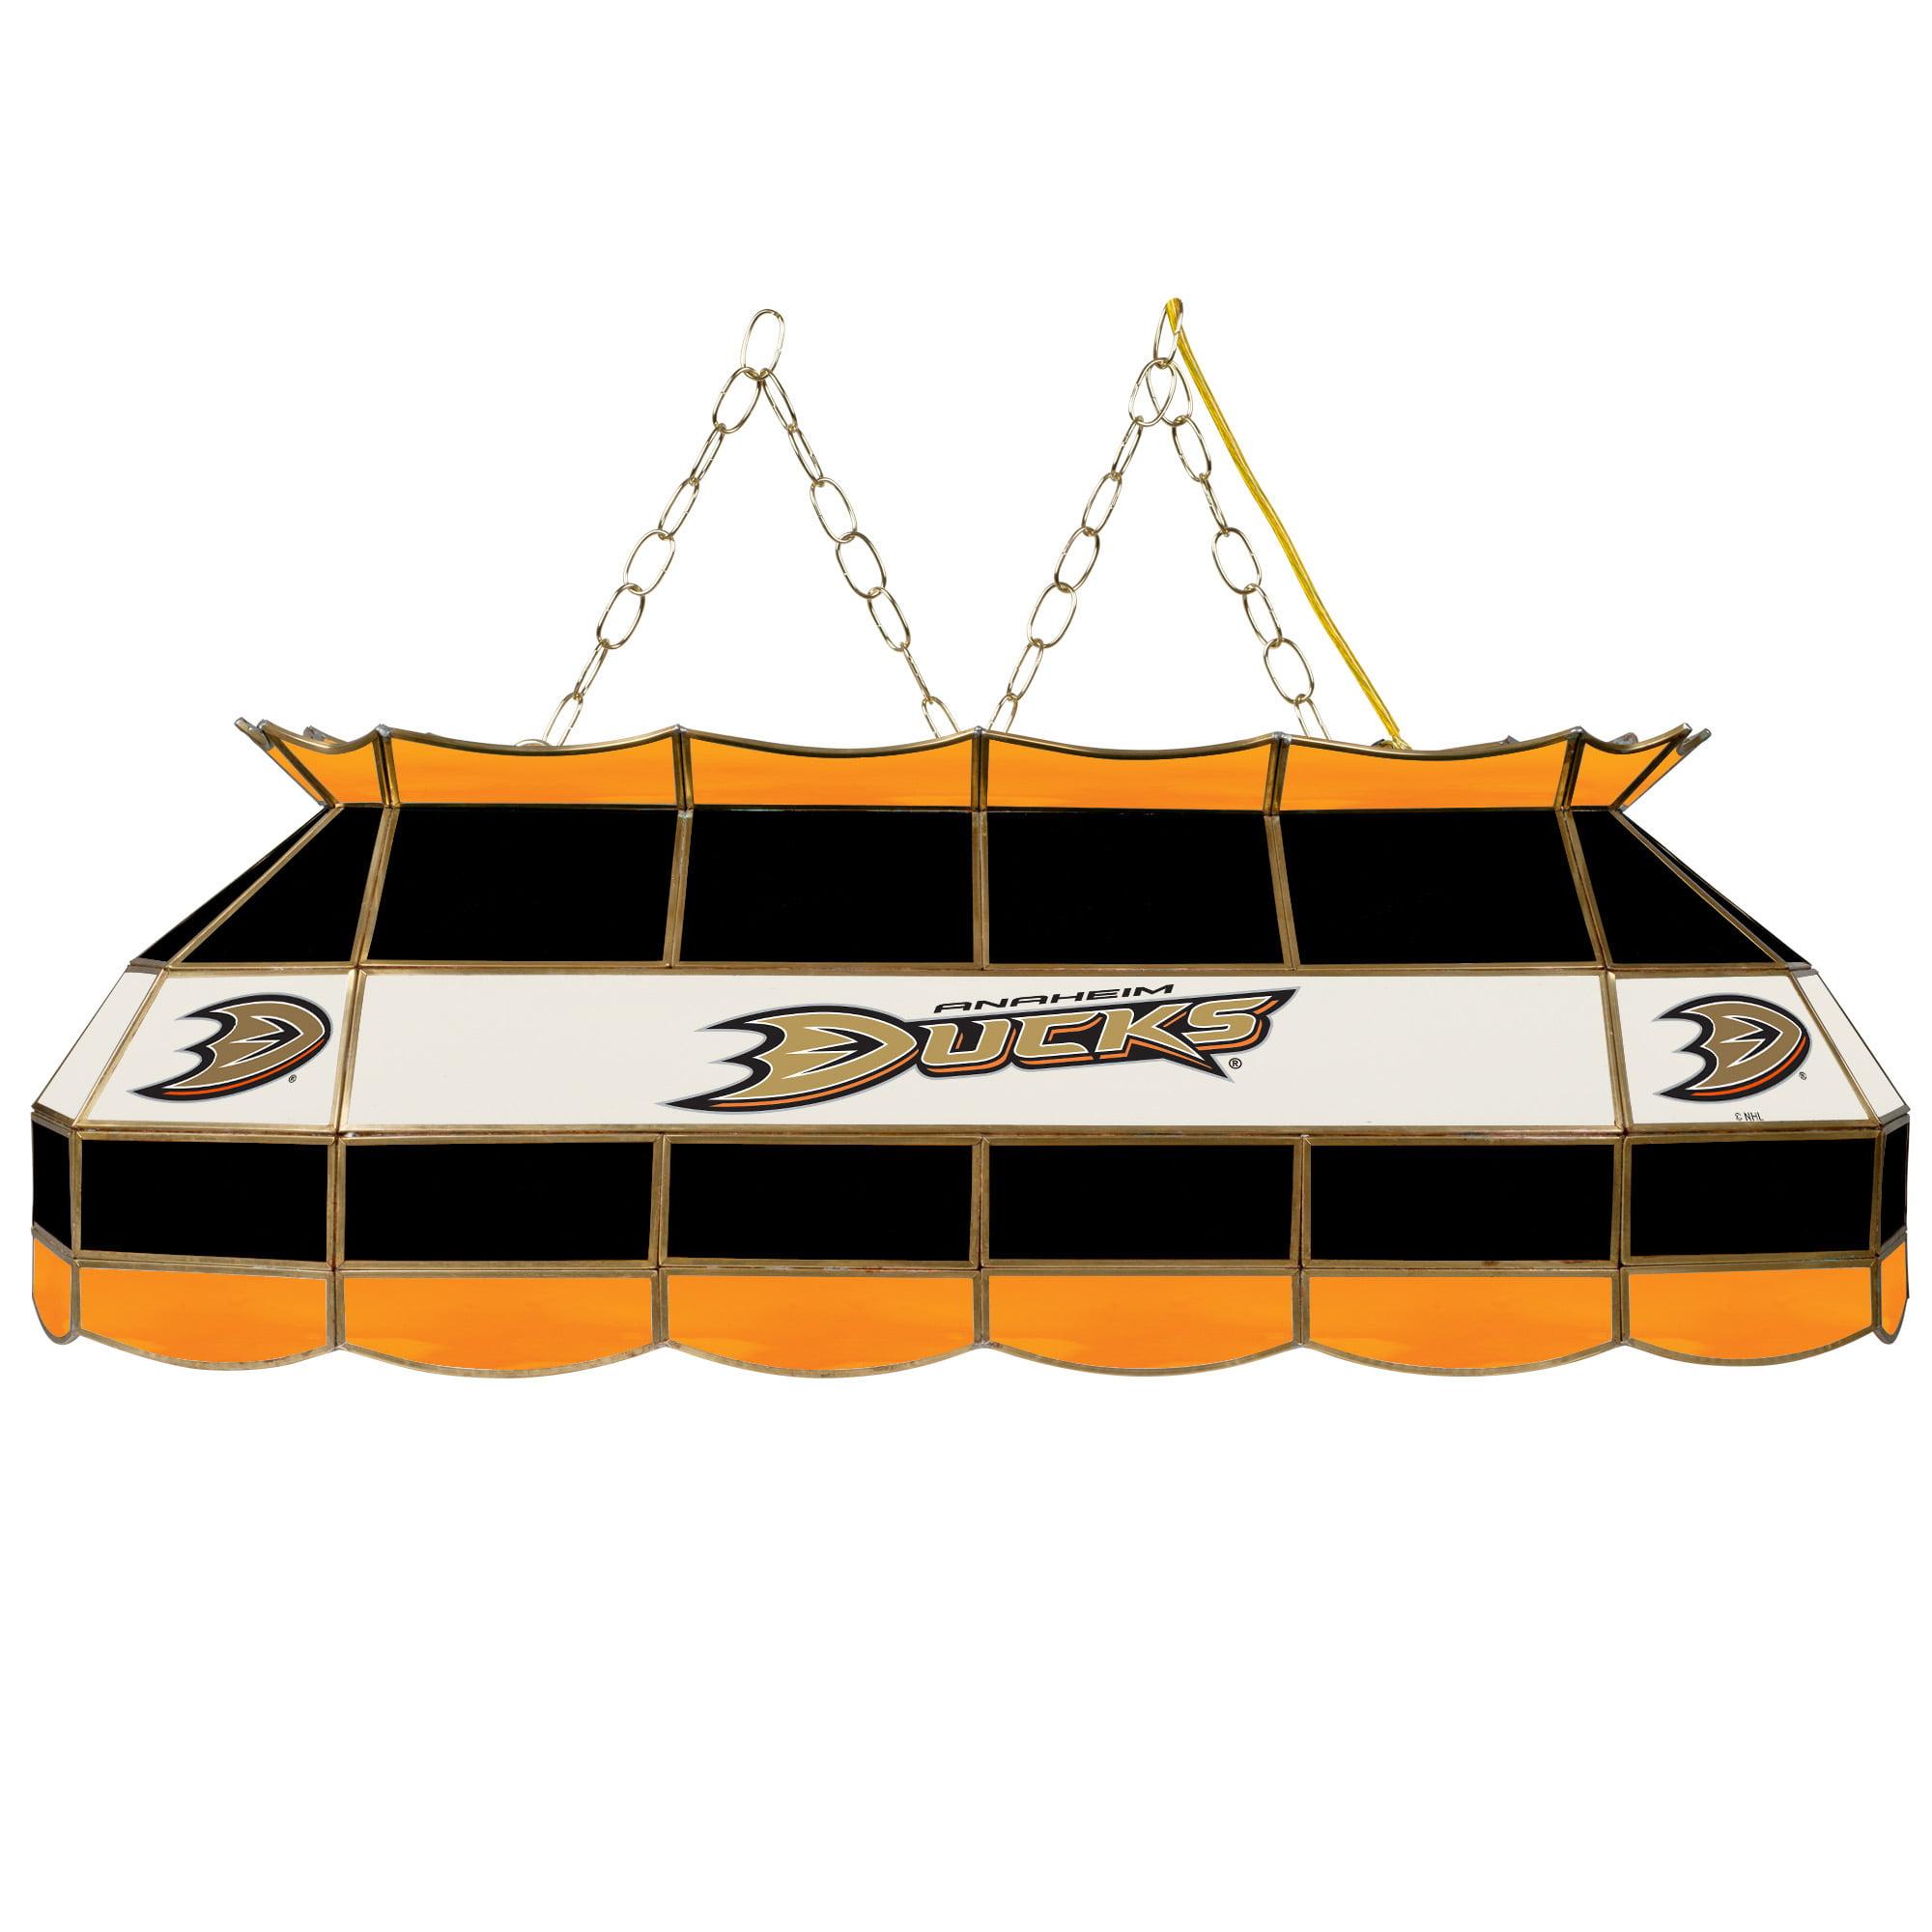 "NHL Handmade Tiffany Style Lamp, 40"", Anaheim Ducks"